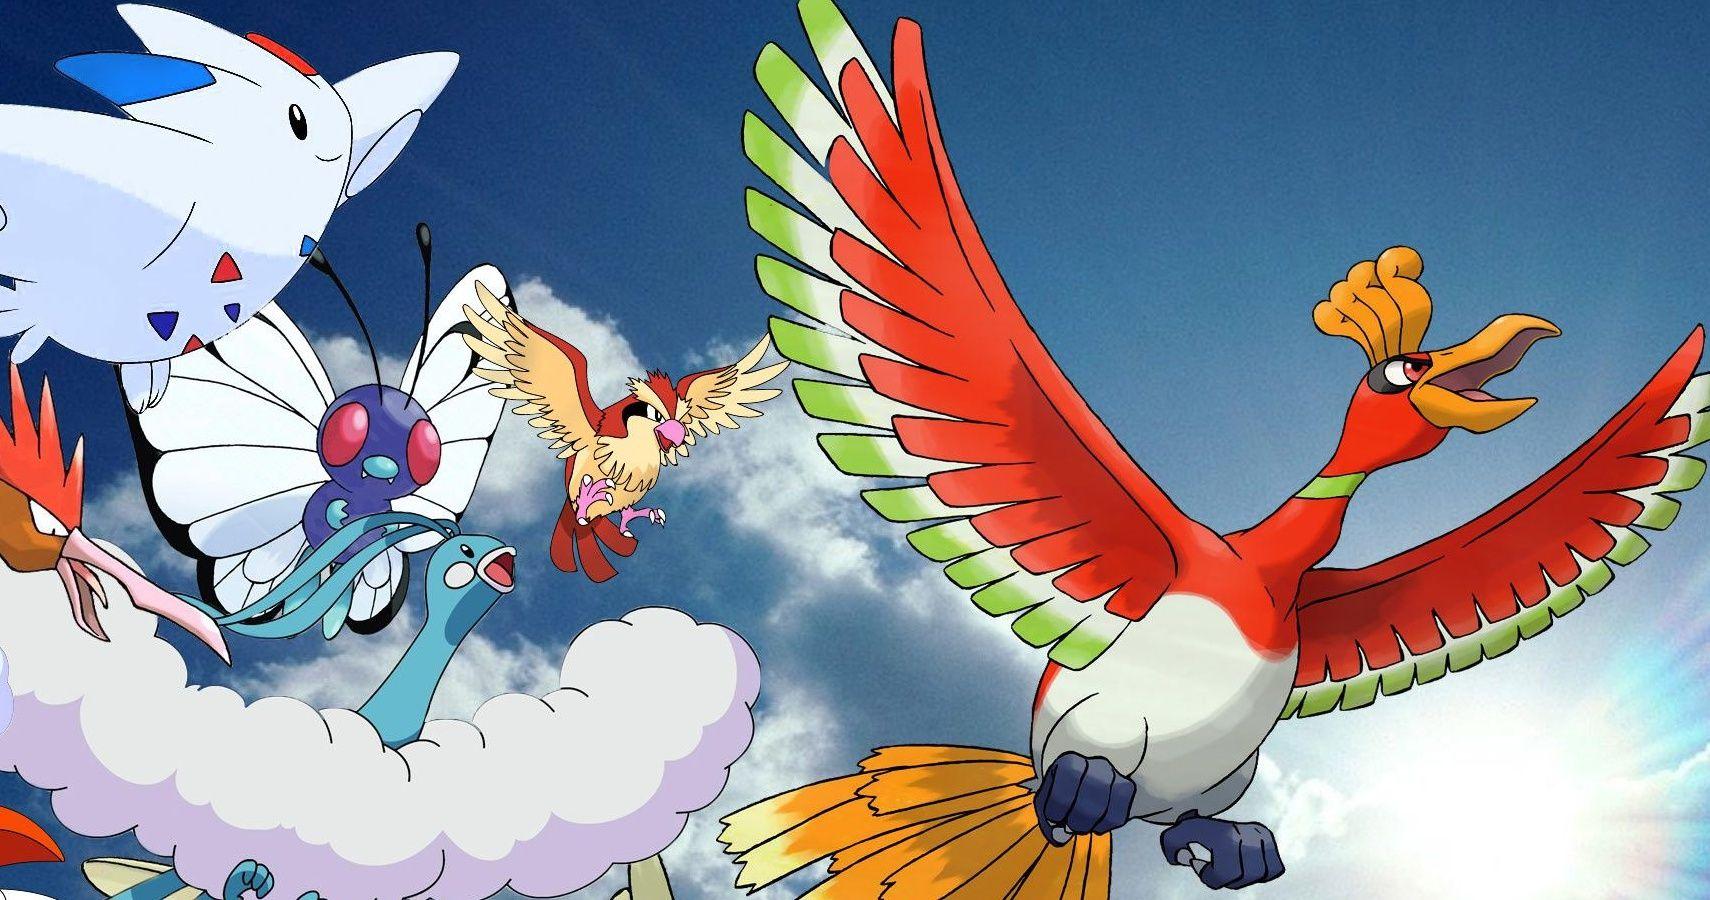 Pokémon Go: 10 Best Flying